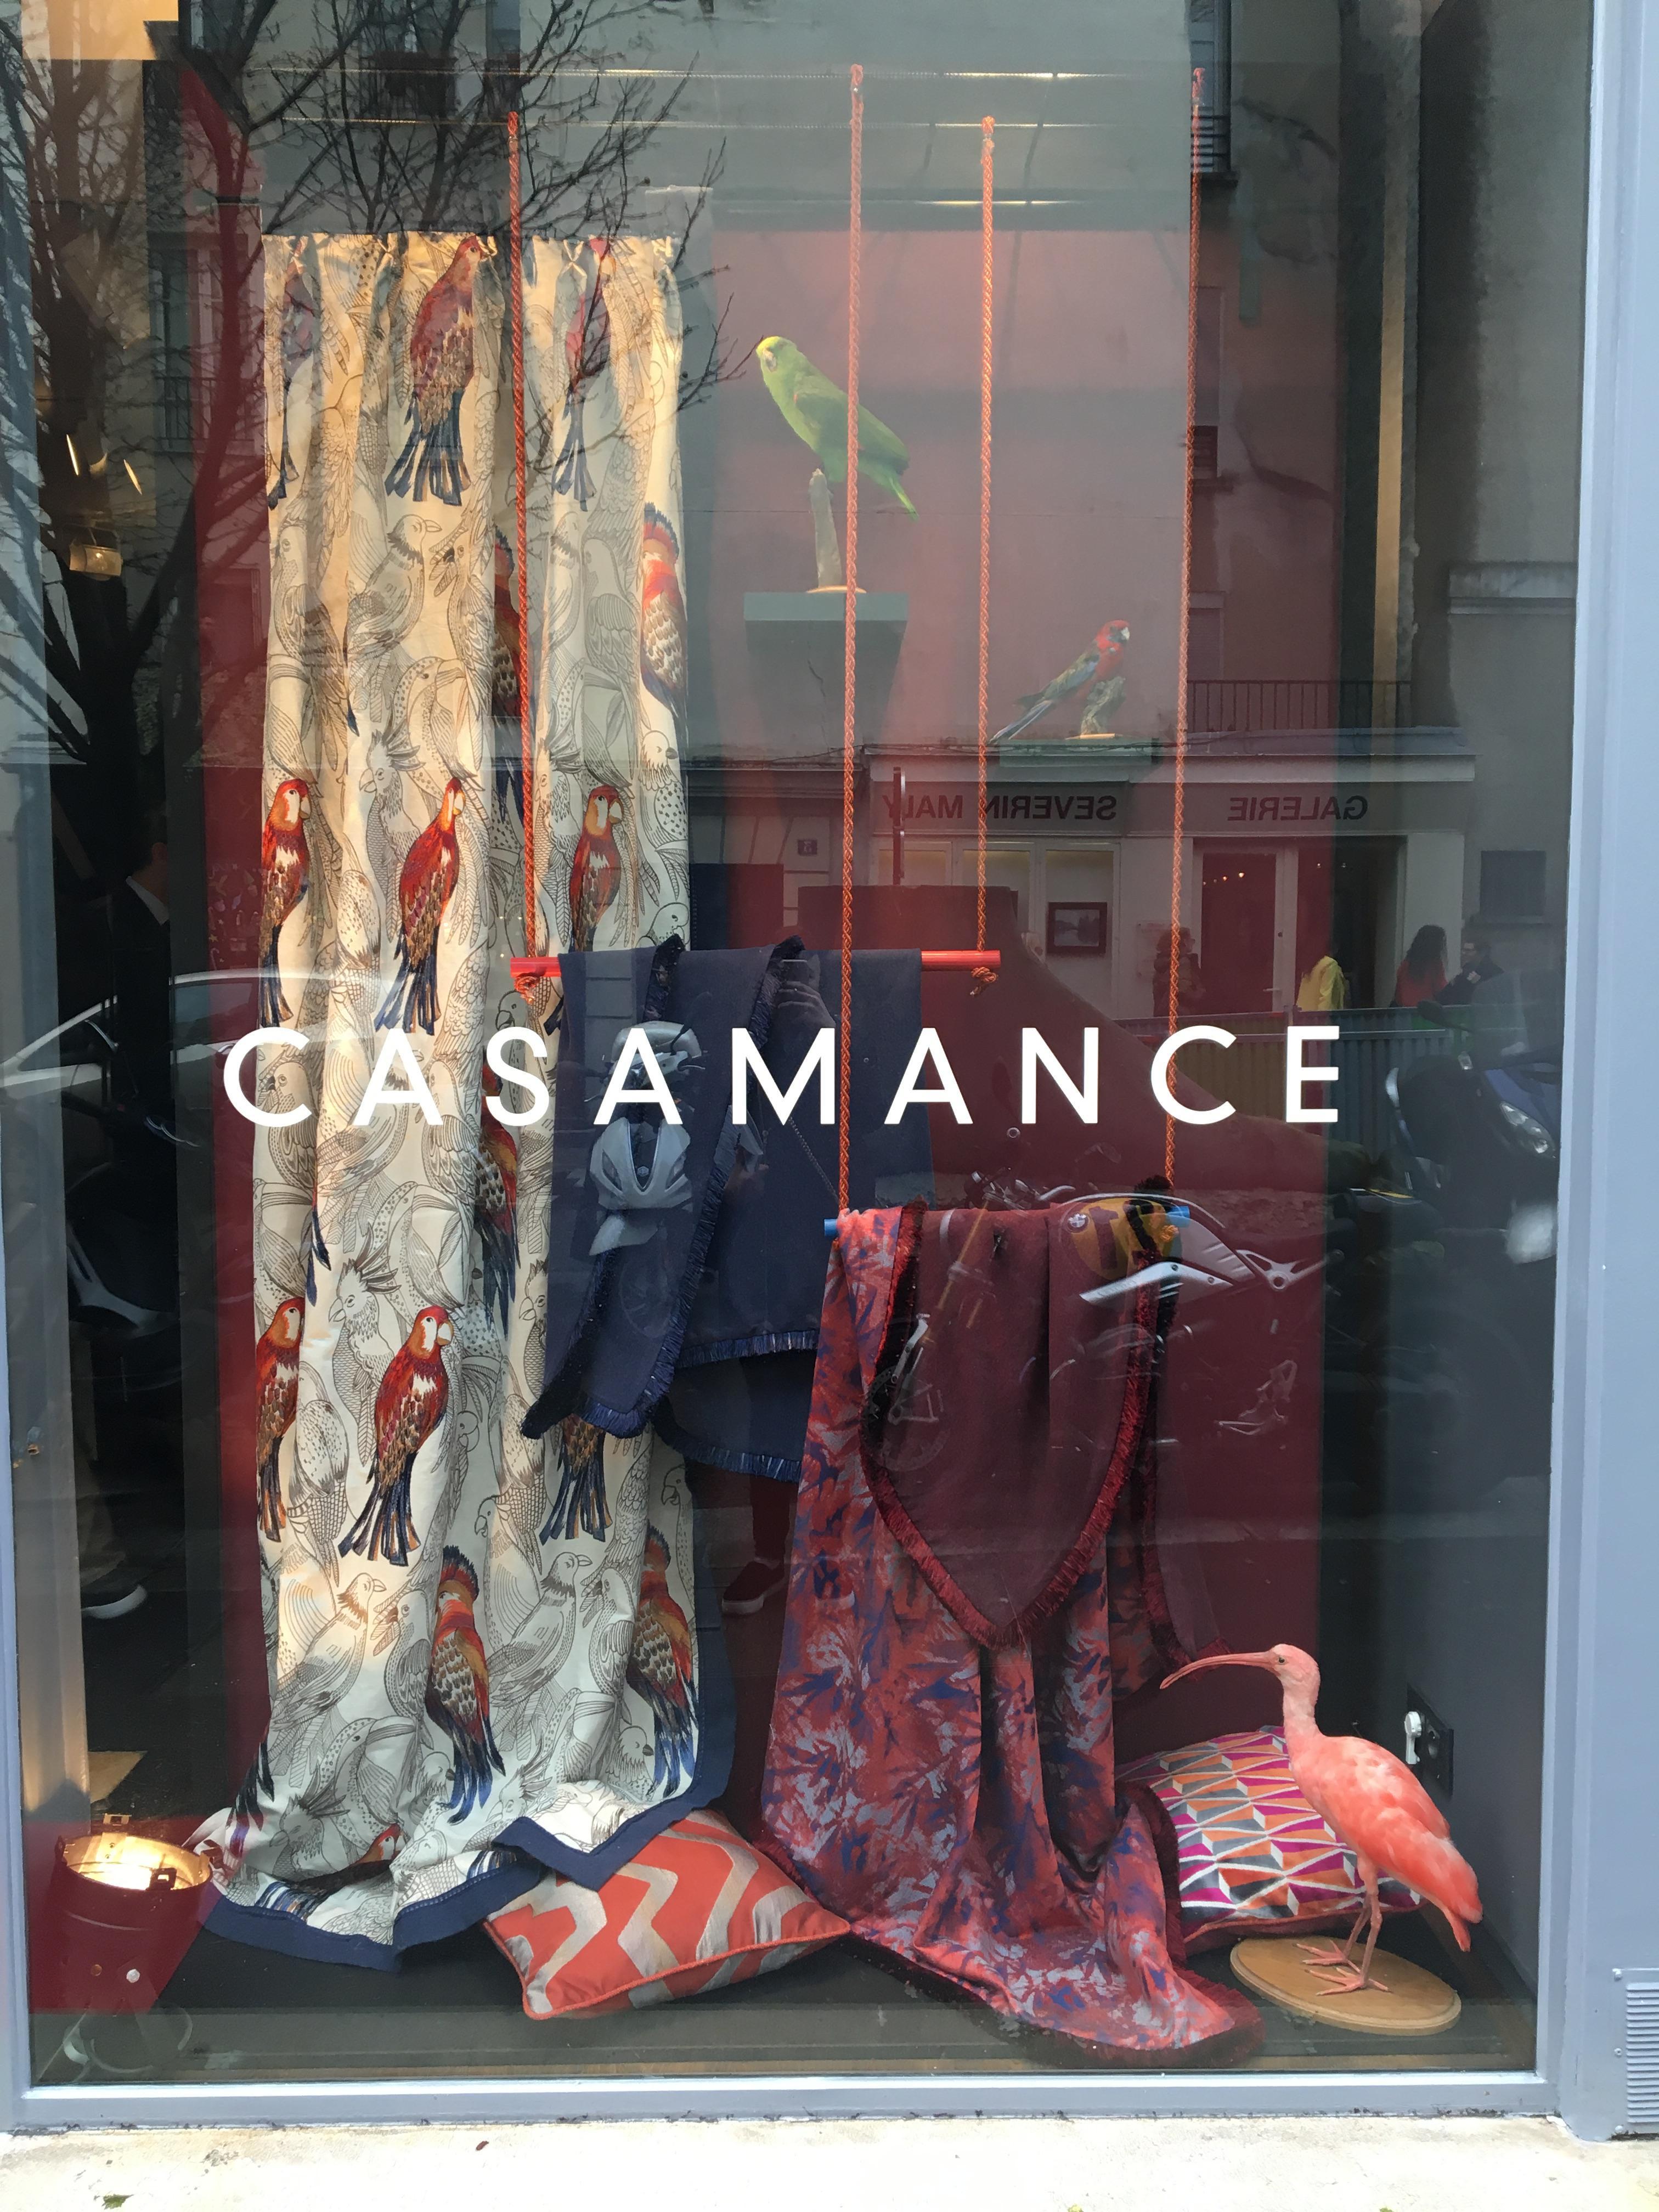 Casamance window, Paris Deco Off 2018